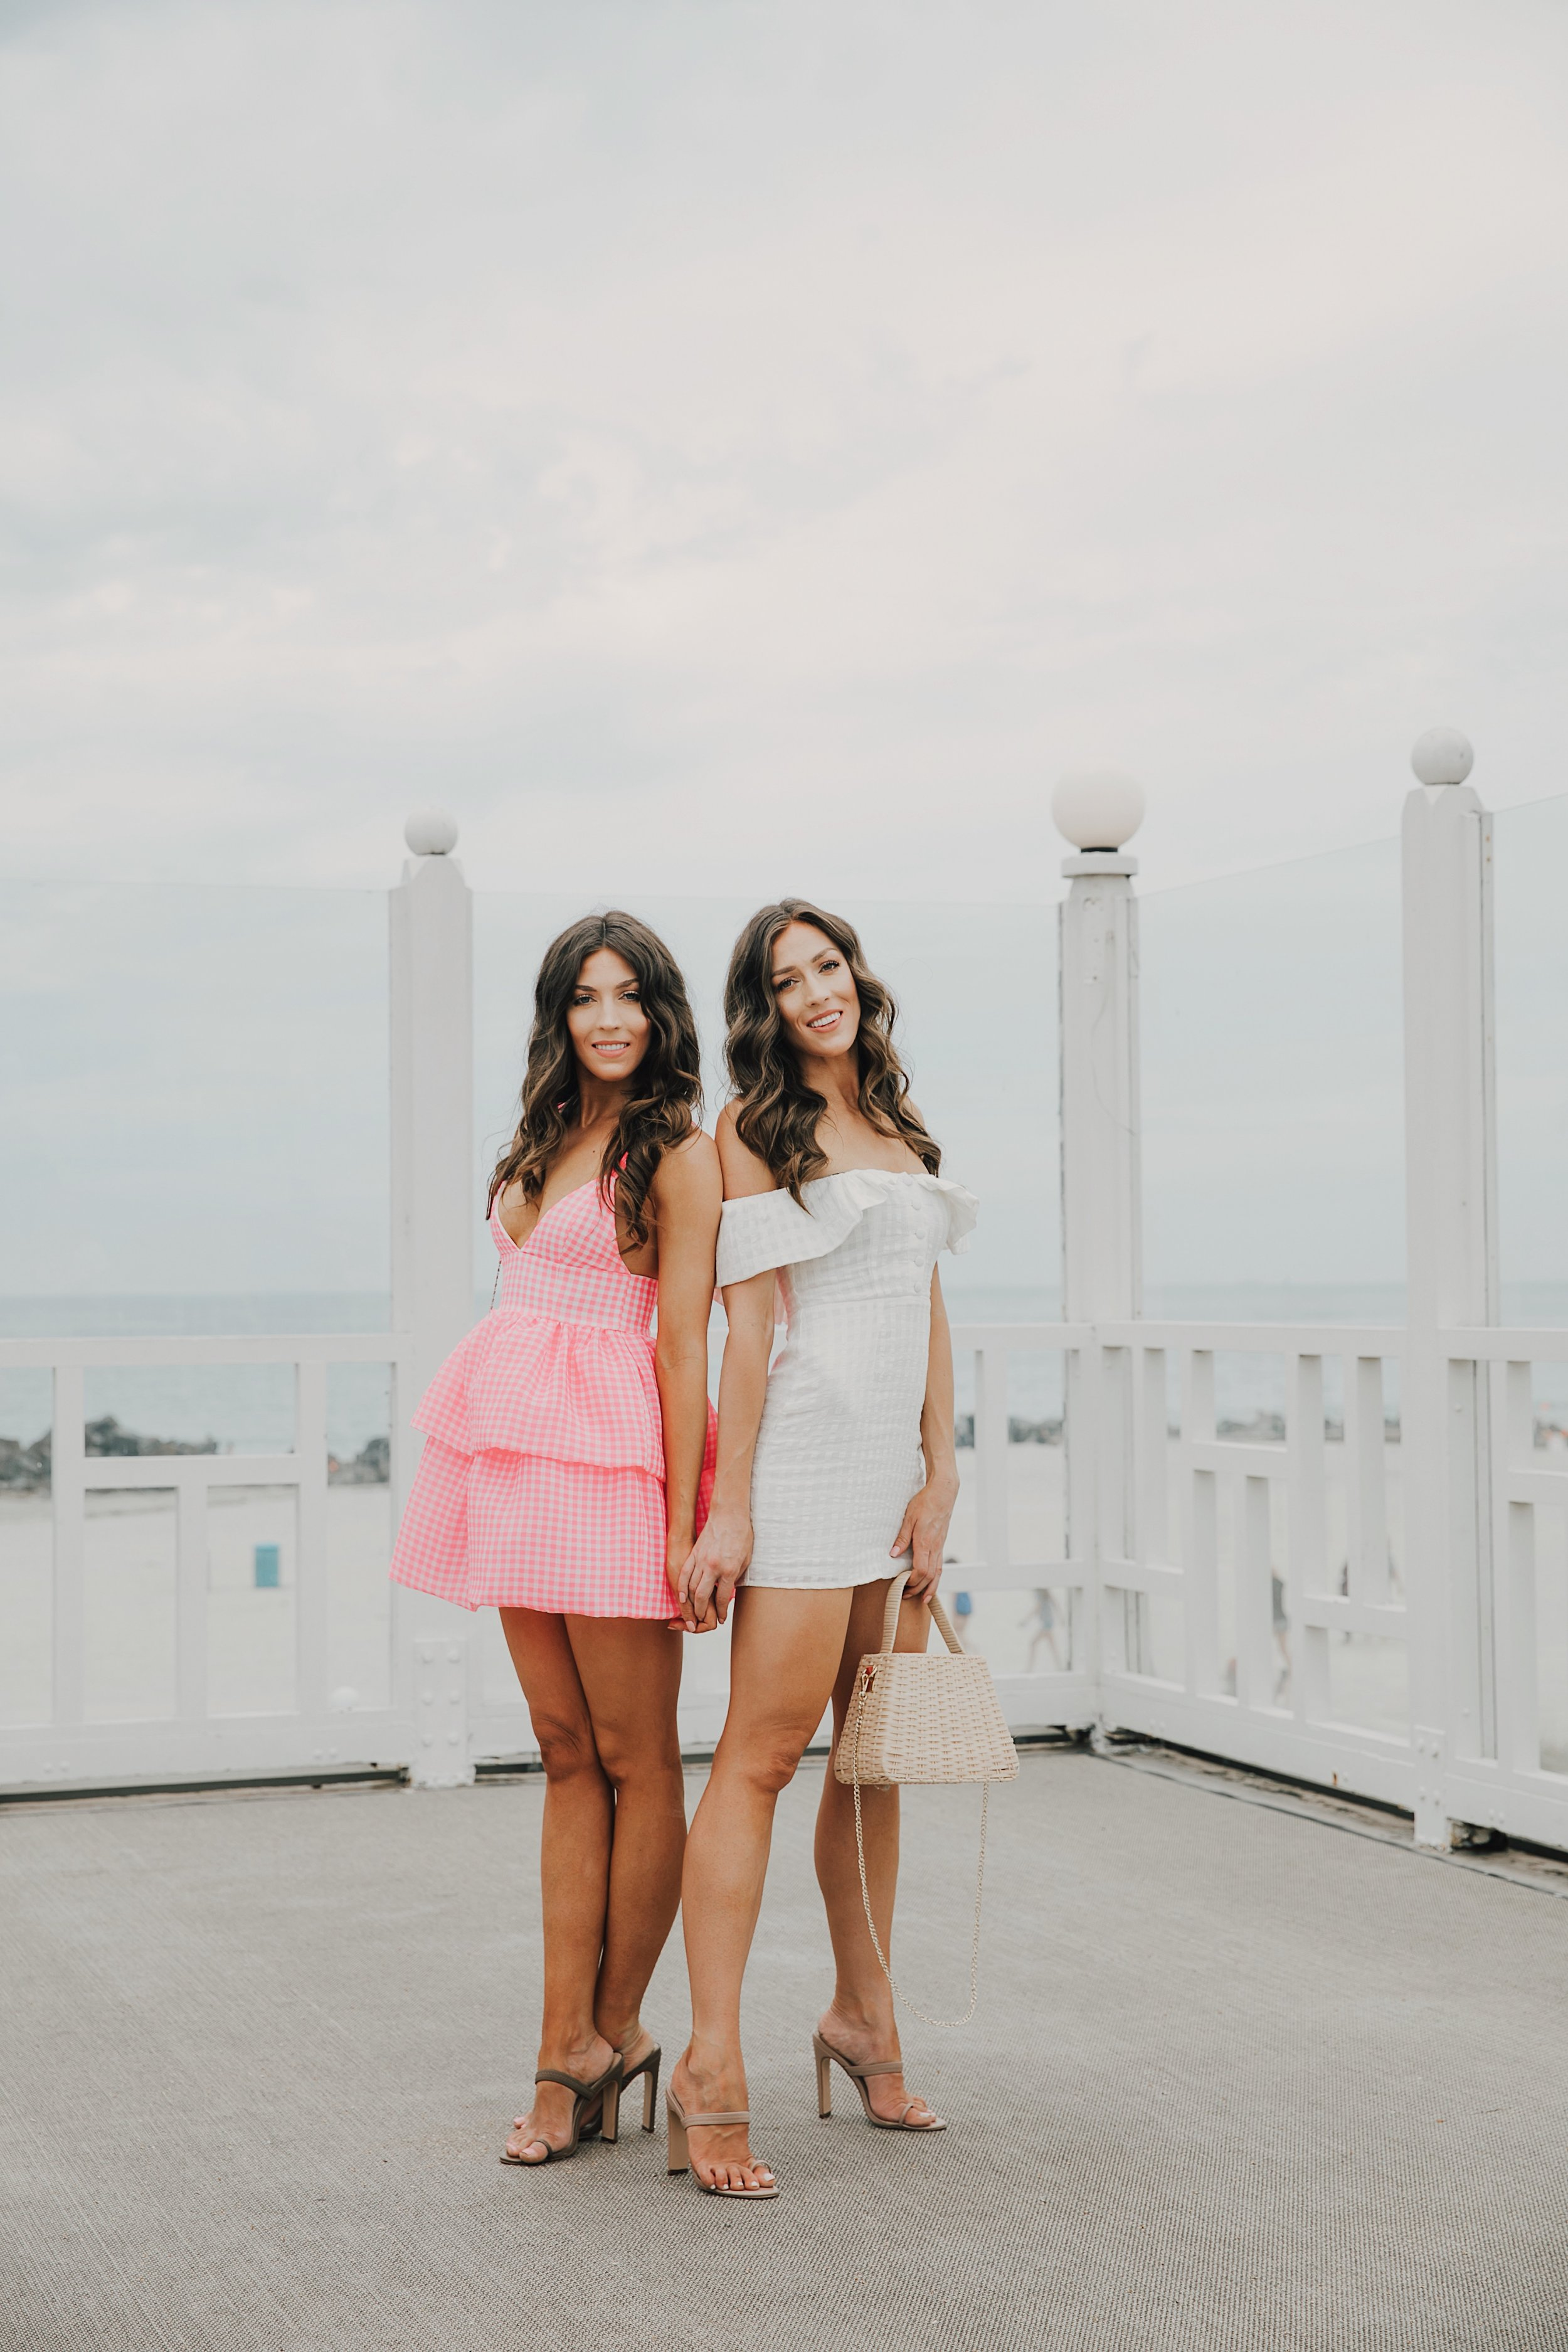 Revolve Gingham Summer Dresses at The Del Coronado 3.JPG